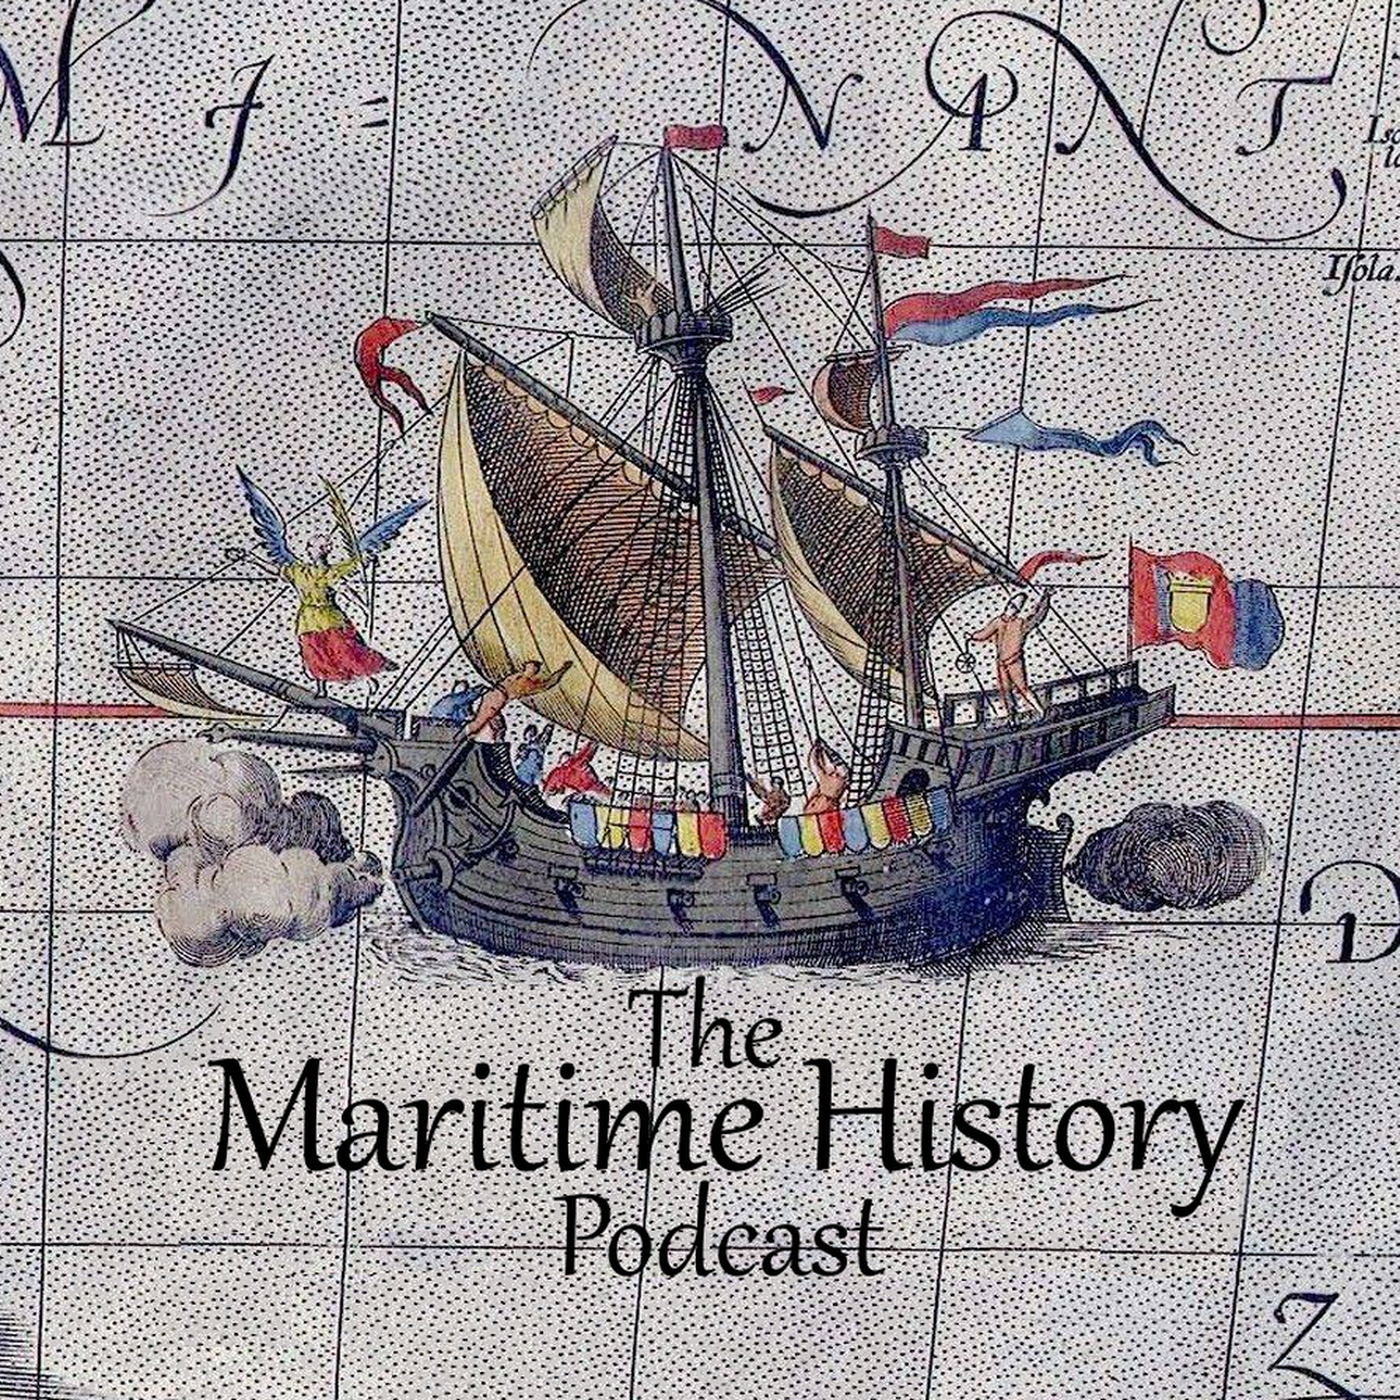 031 - A Persian Navy, an Ionian Revolt